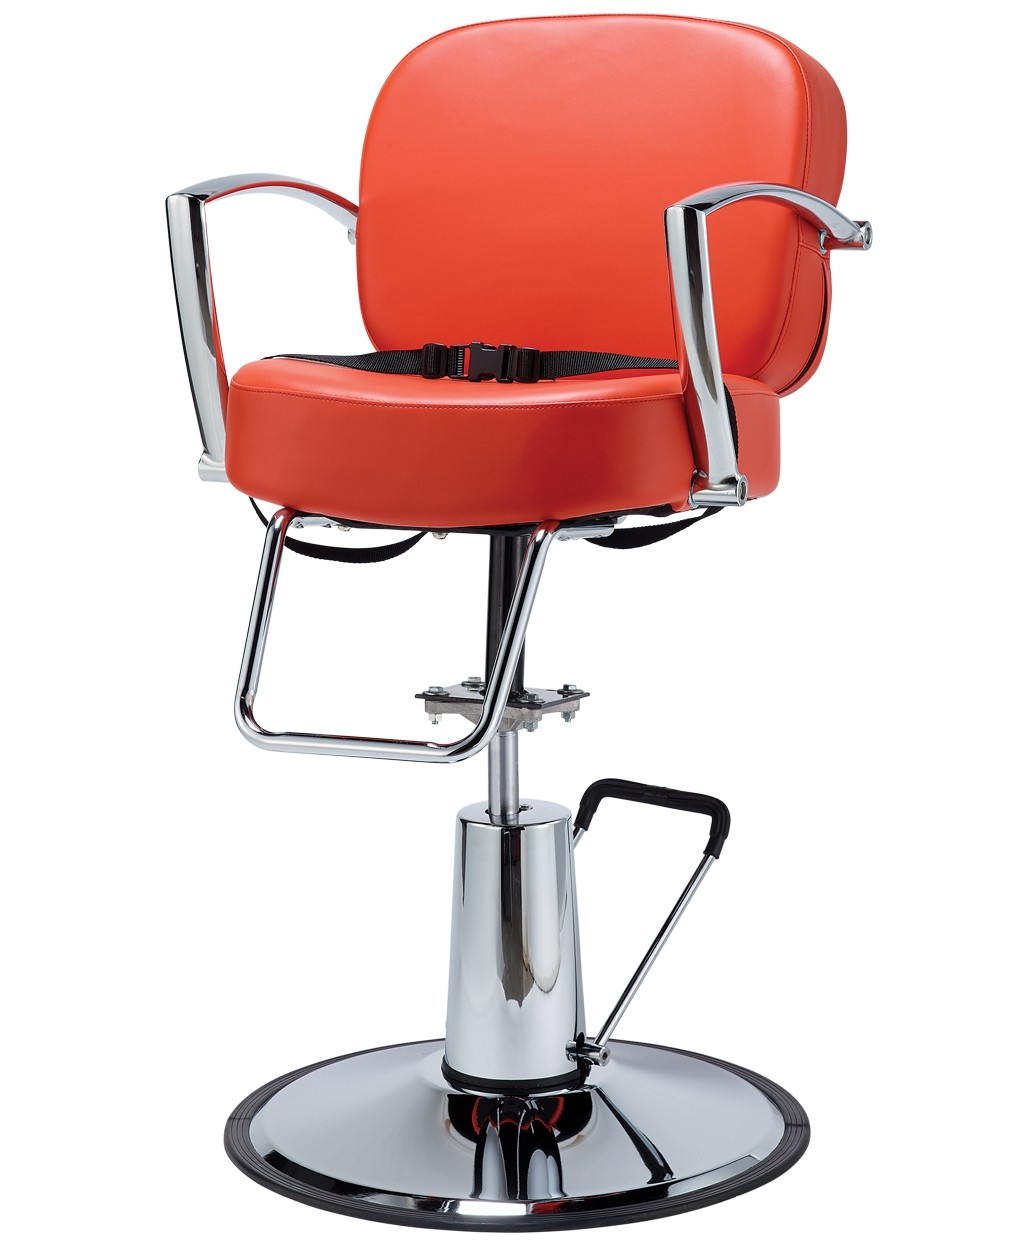 Pibbs 3770 Pisa Kid's Styling Chair